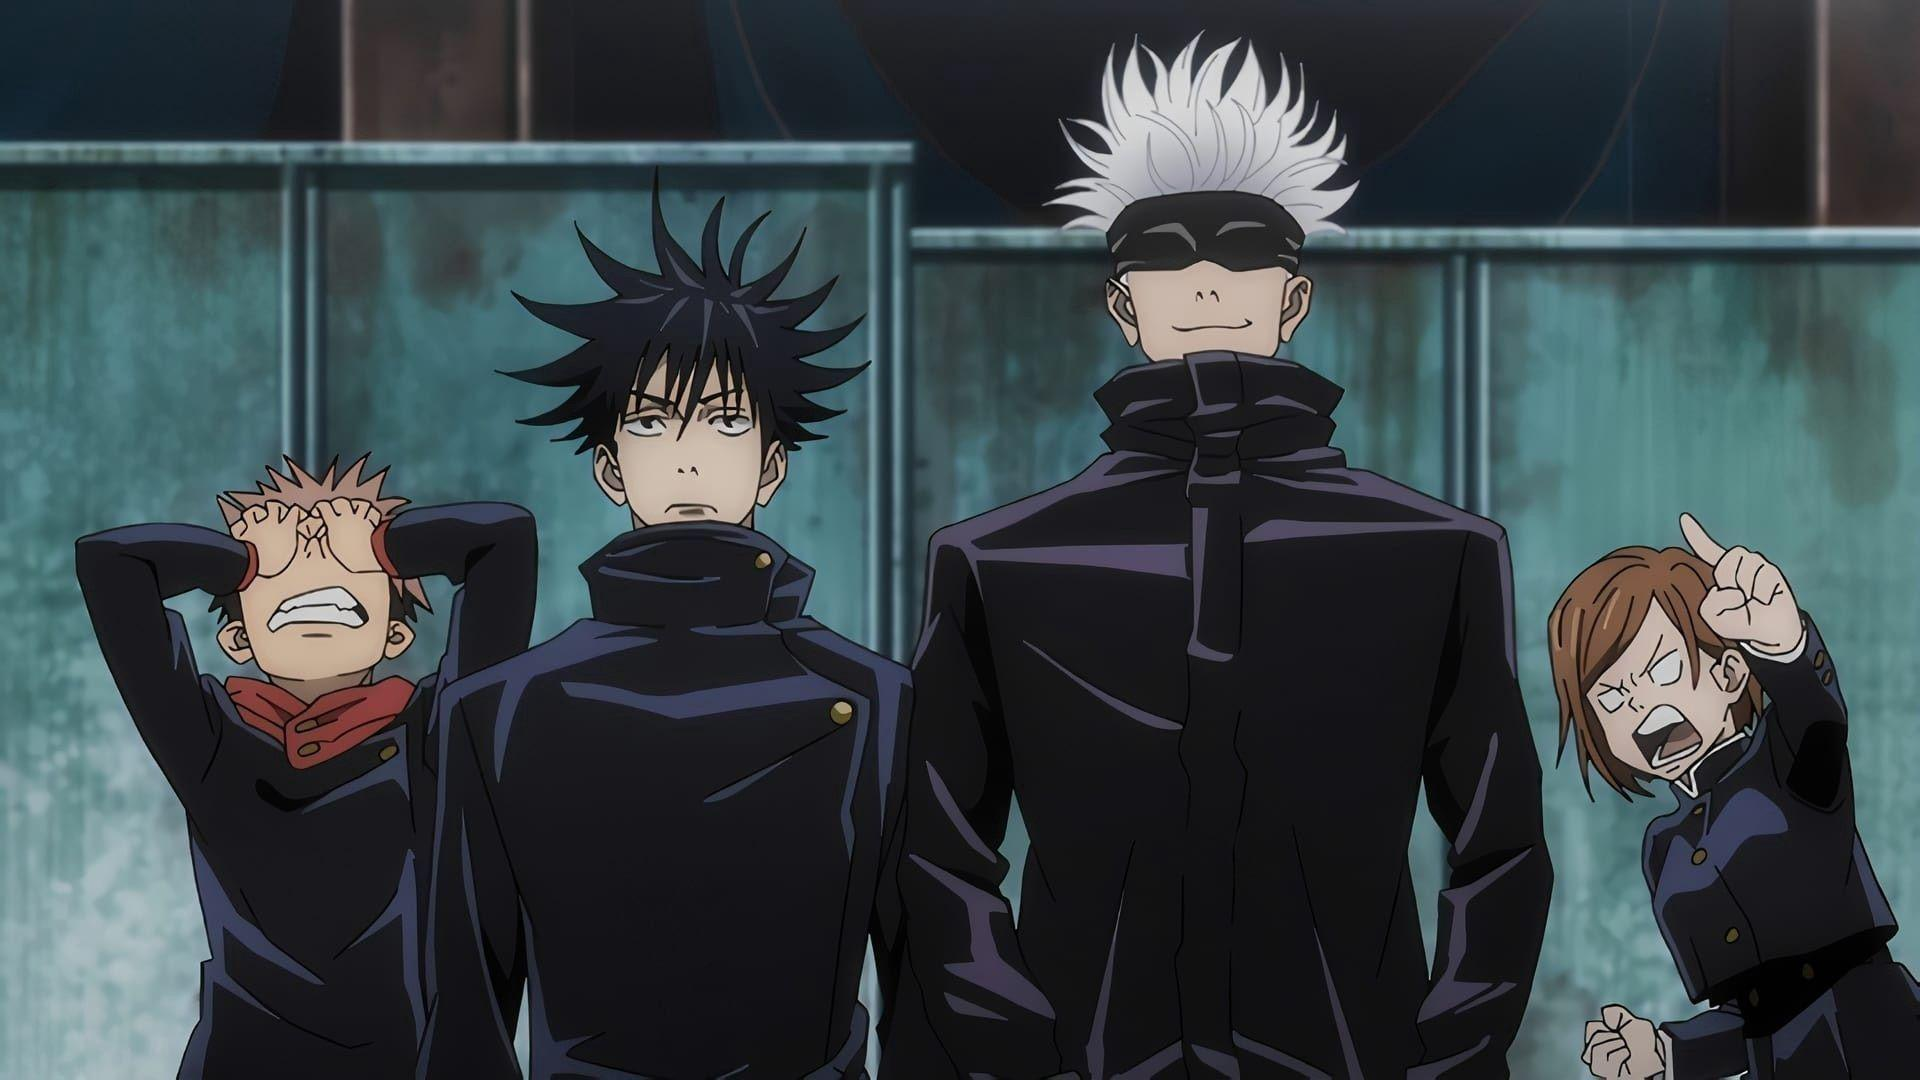 Jujutsu-Kaisen-O-Anime-Film-Fans-Simping-Over-Young-Gojo!